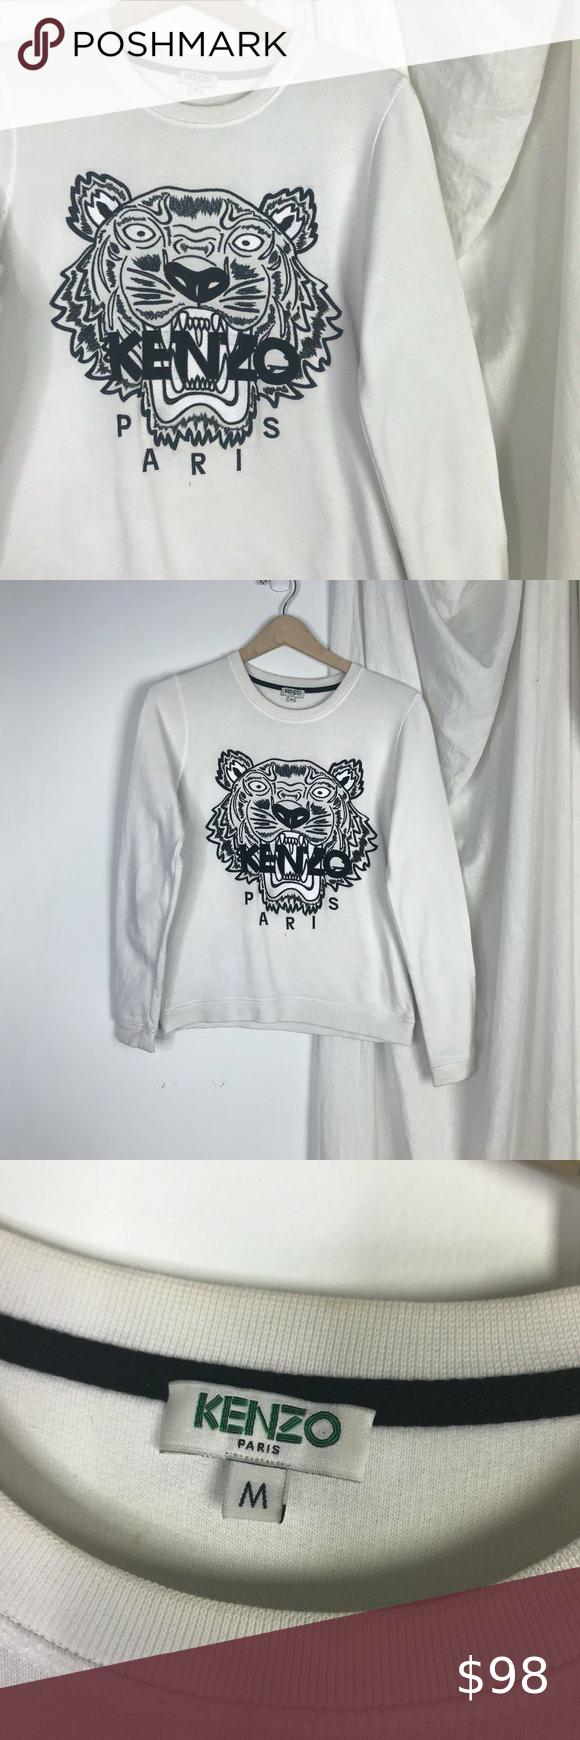 Kenzo Paris White Tiger Embroidered Sweatshirt Embroidered Sweatshirts Sweatshirts Kenzo Sweatshirt [ 1740 x 580 Pixel ]